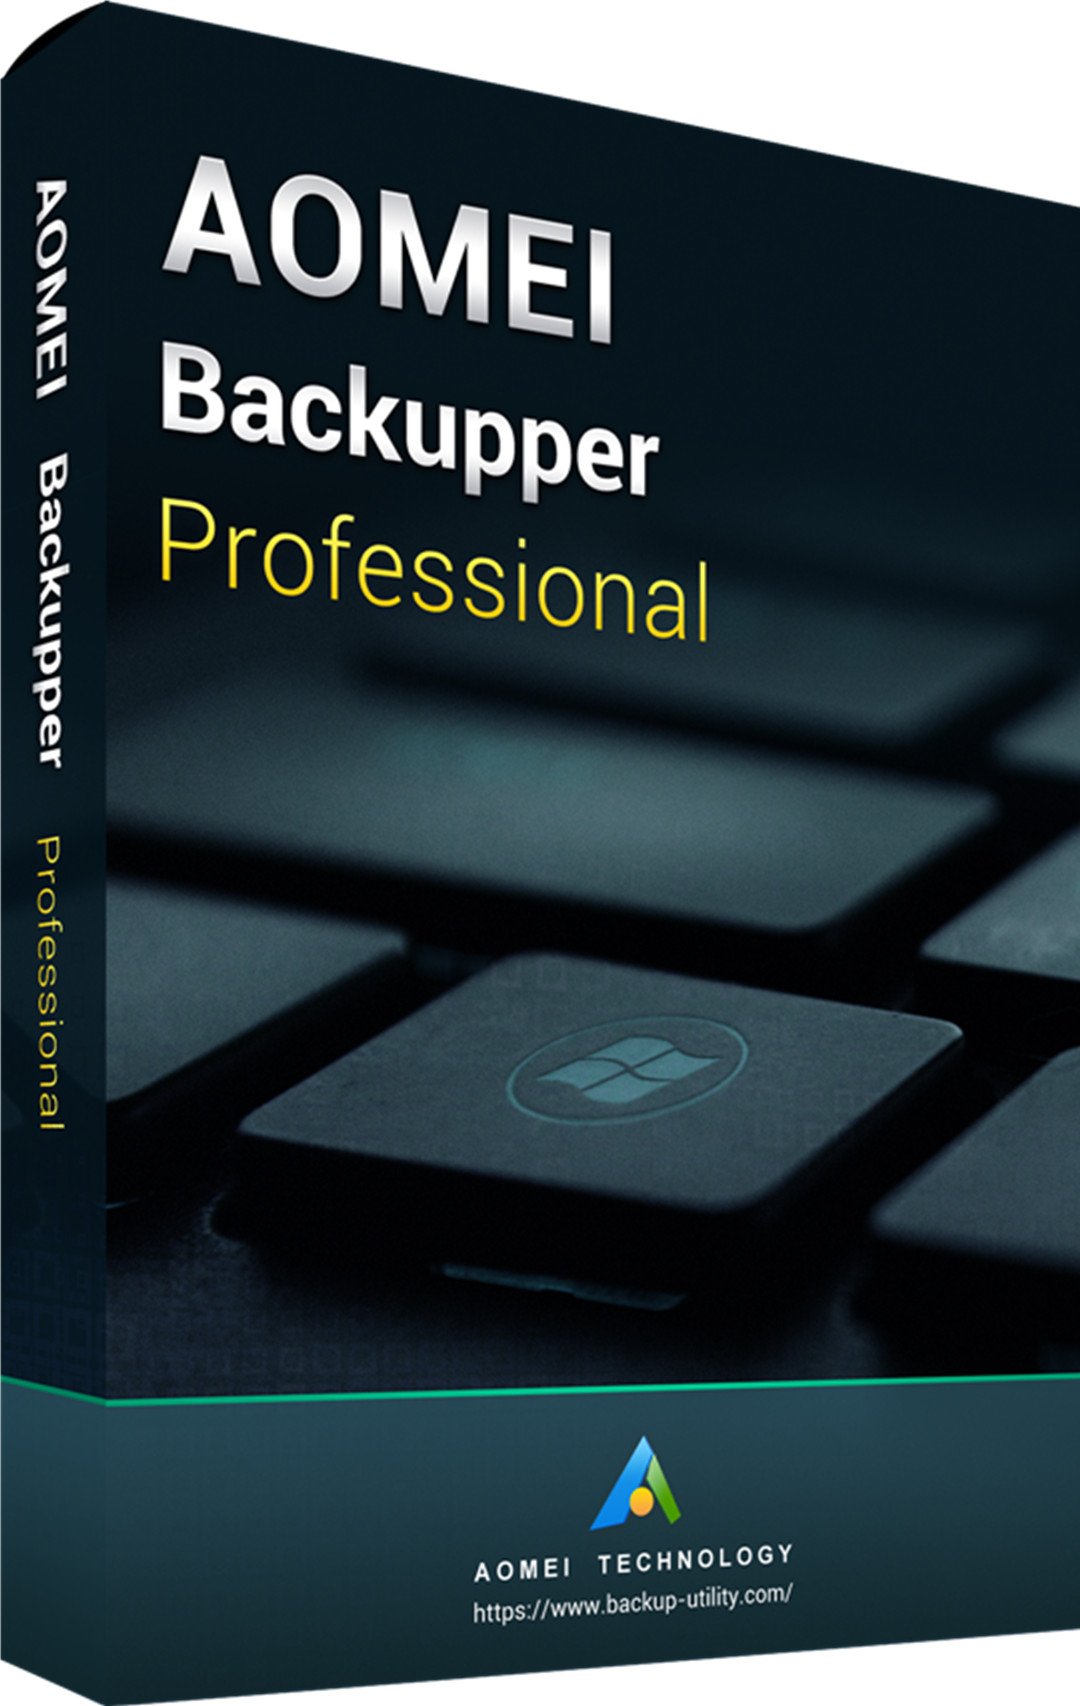 AOMEI Backupper Professional Edition 365 Days 5.0 Key Global